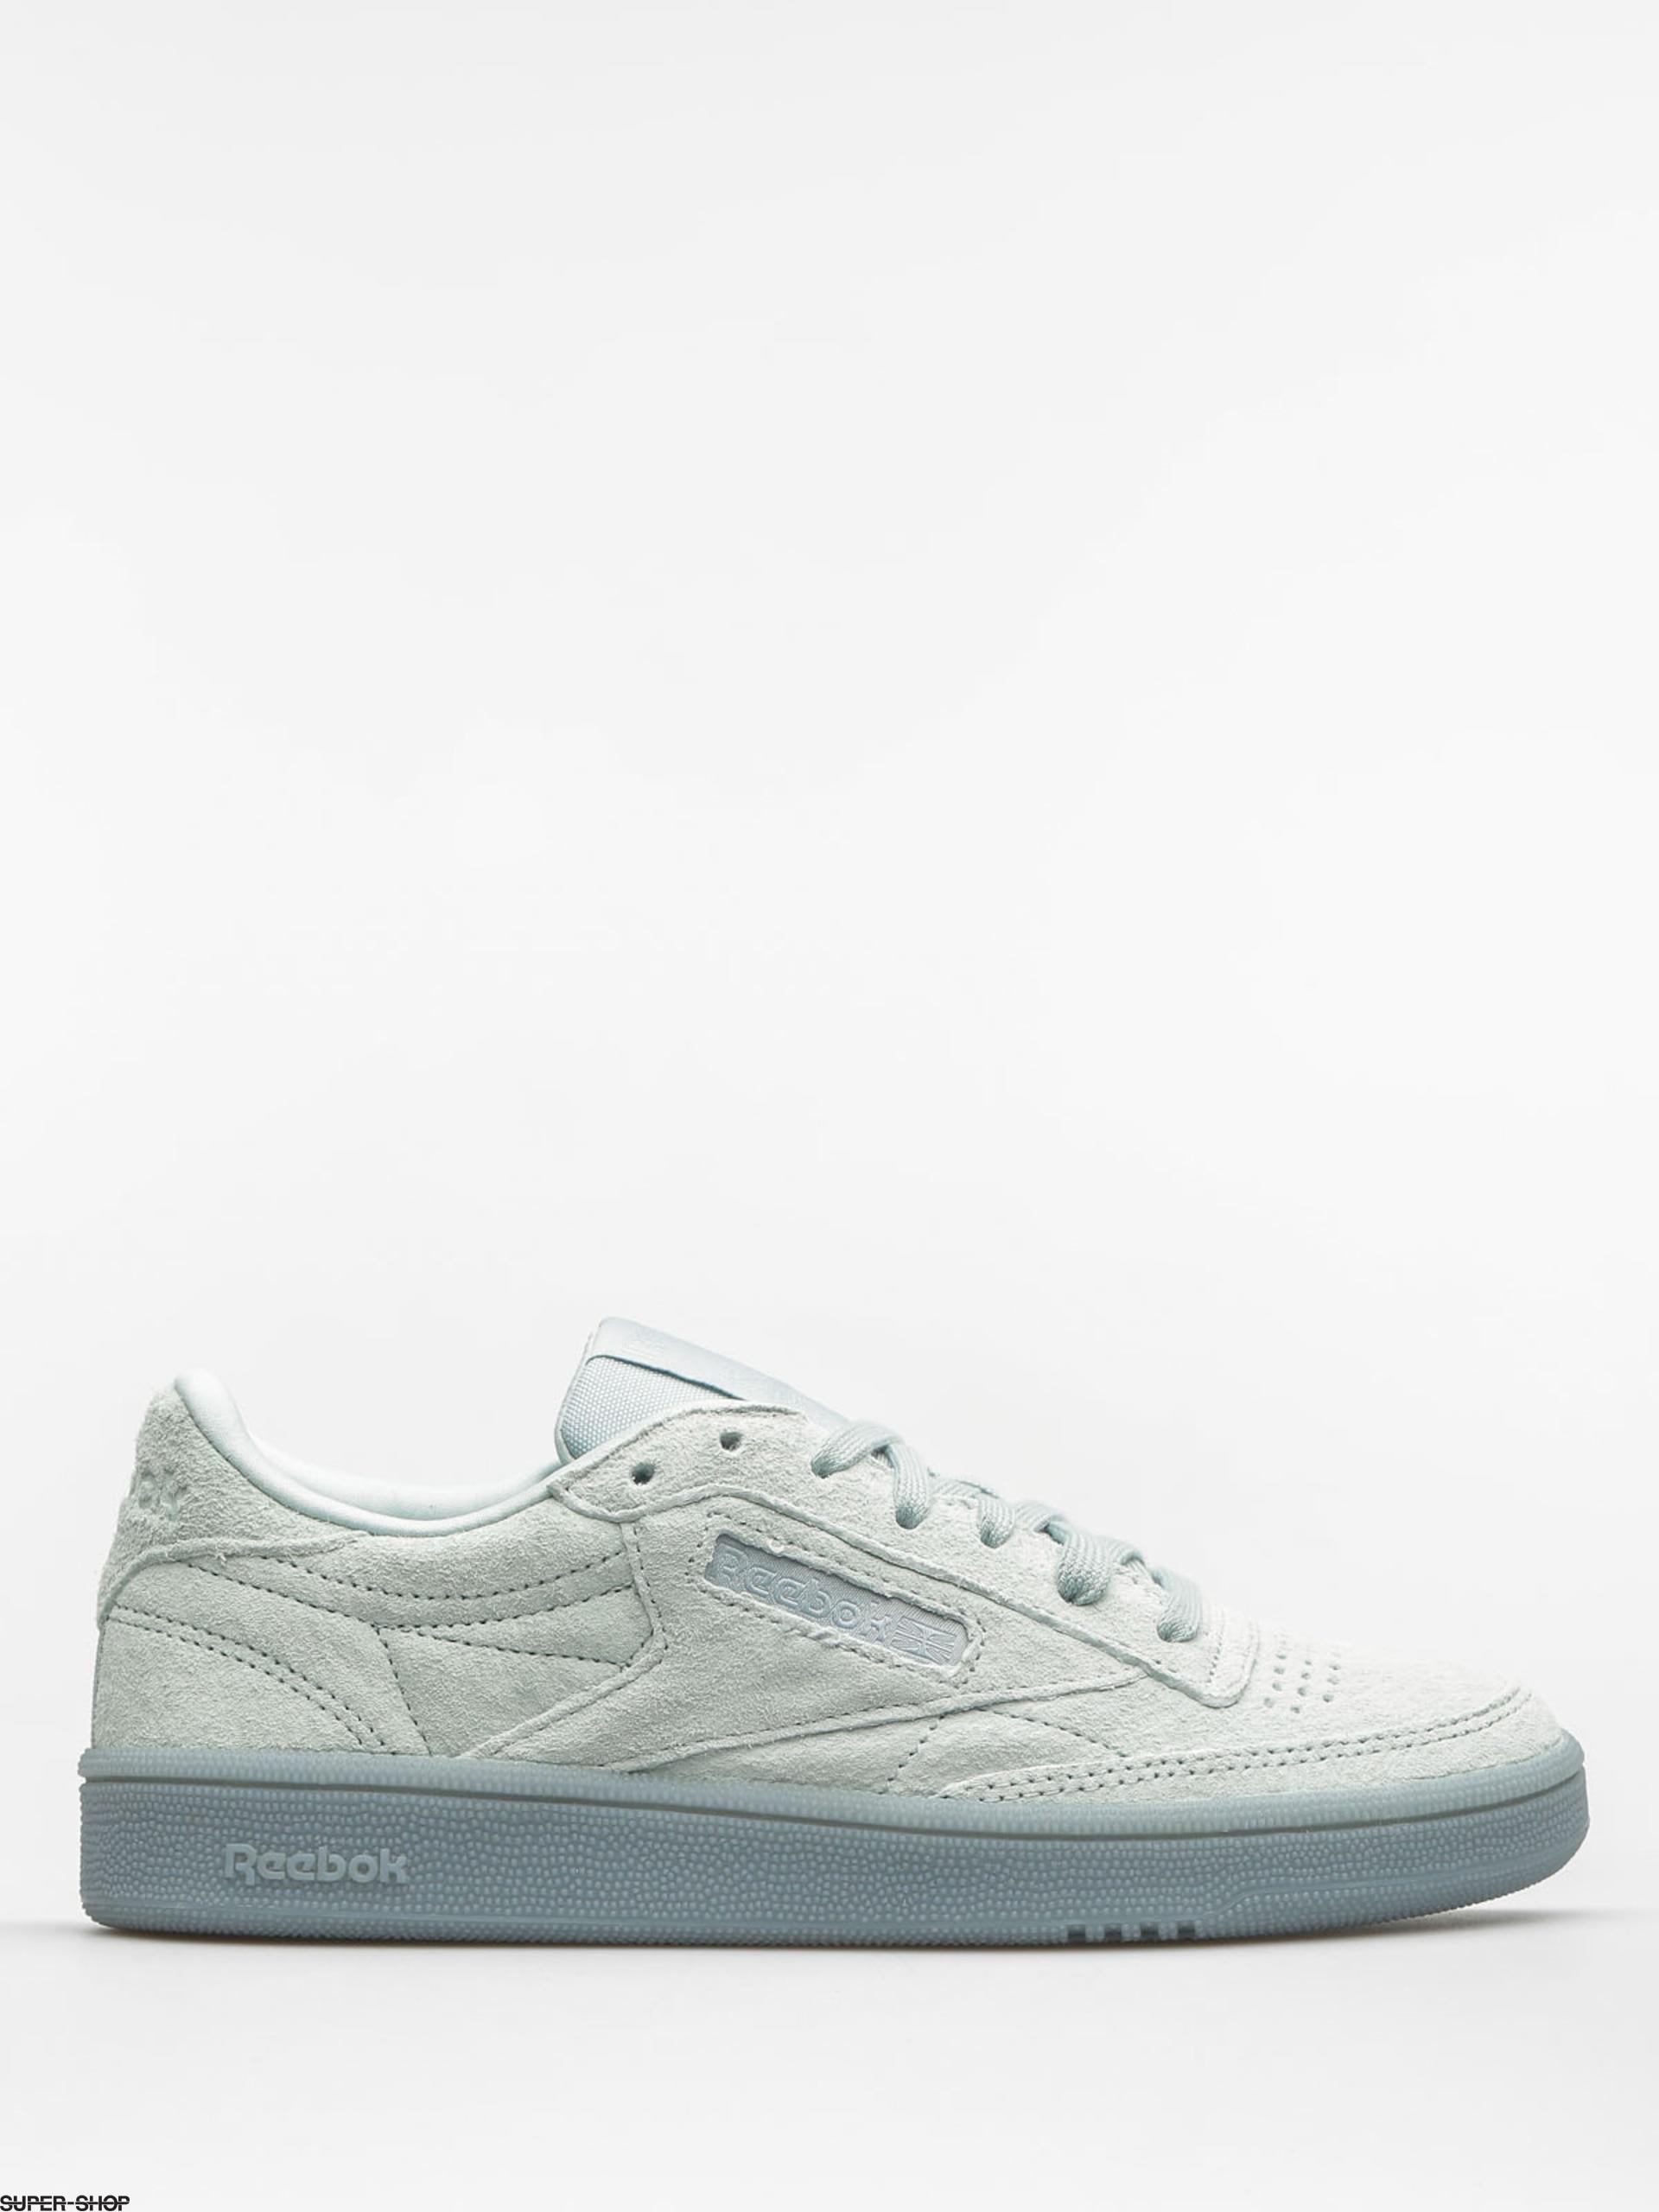 d64c642f9dad3 Reebok Shoes Club C 85 Lace Wmn (seaside grey white)